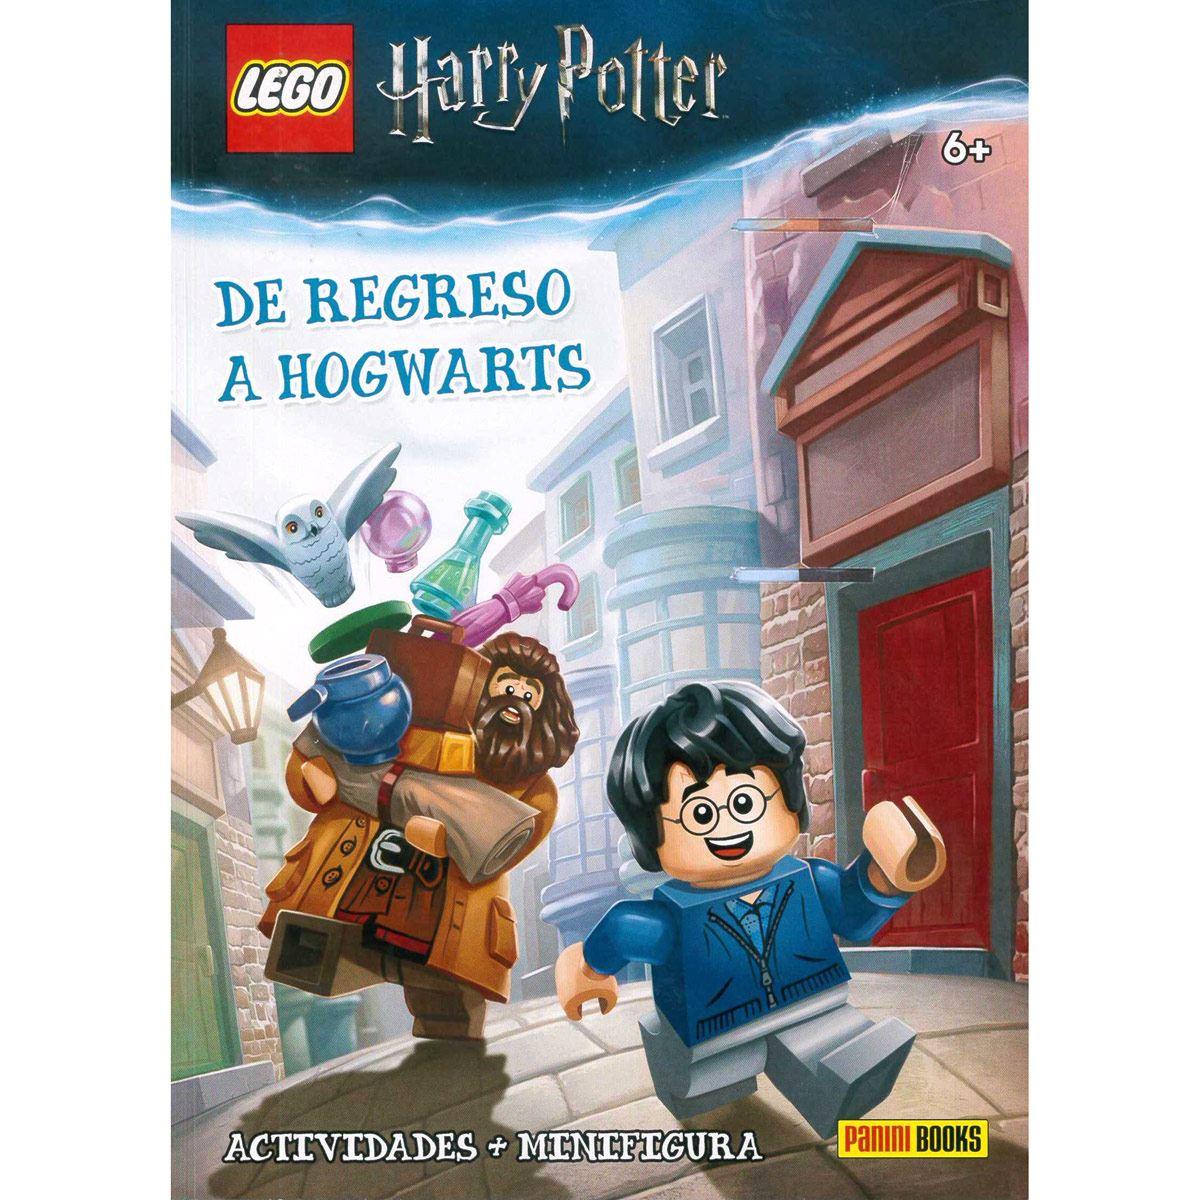 Lego Harry Potter de regreso a Hogwarts